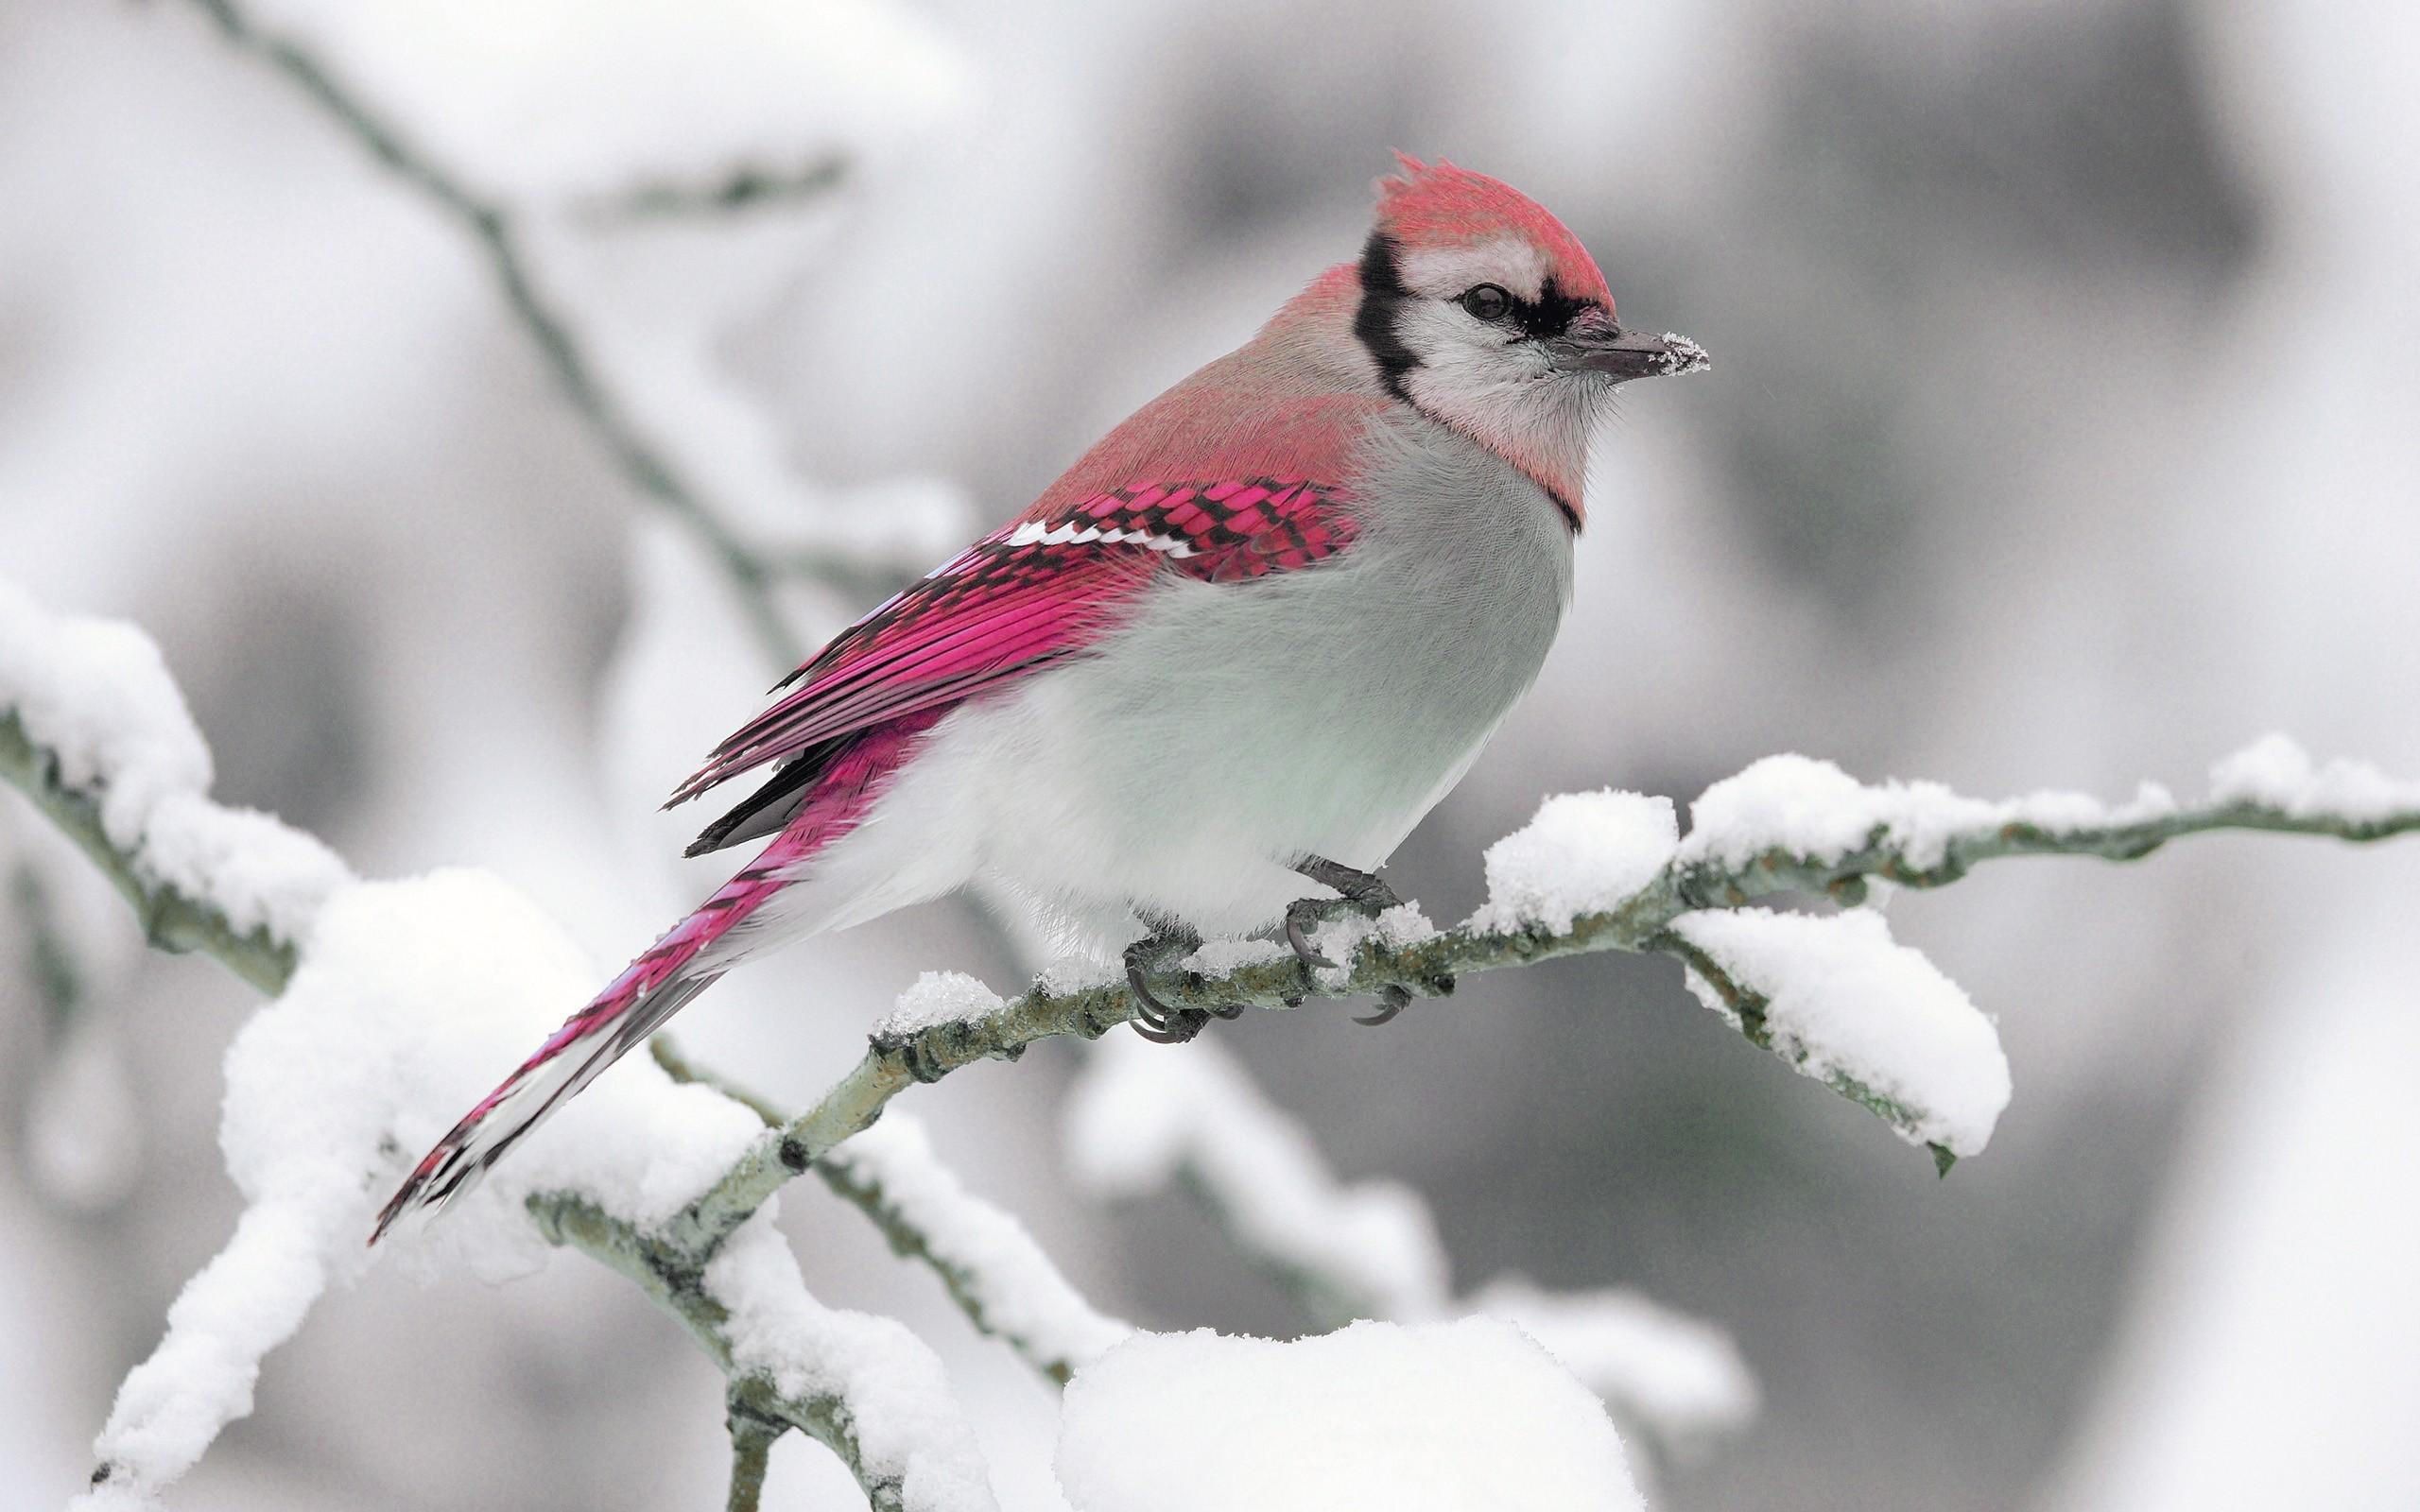 Snow Bird Animal Wallpaper Background Wallpaper with .